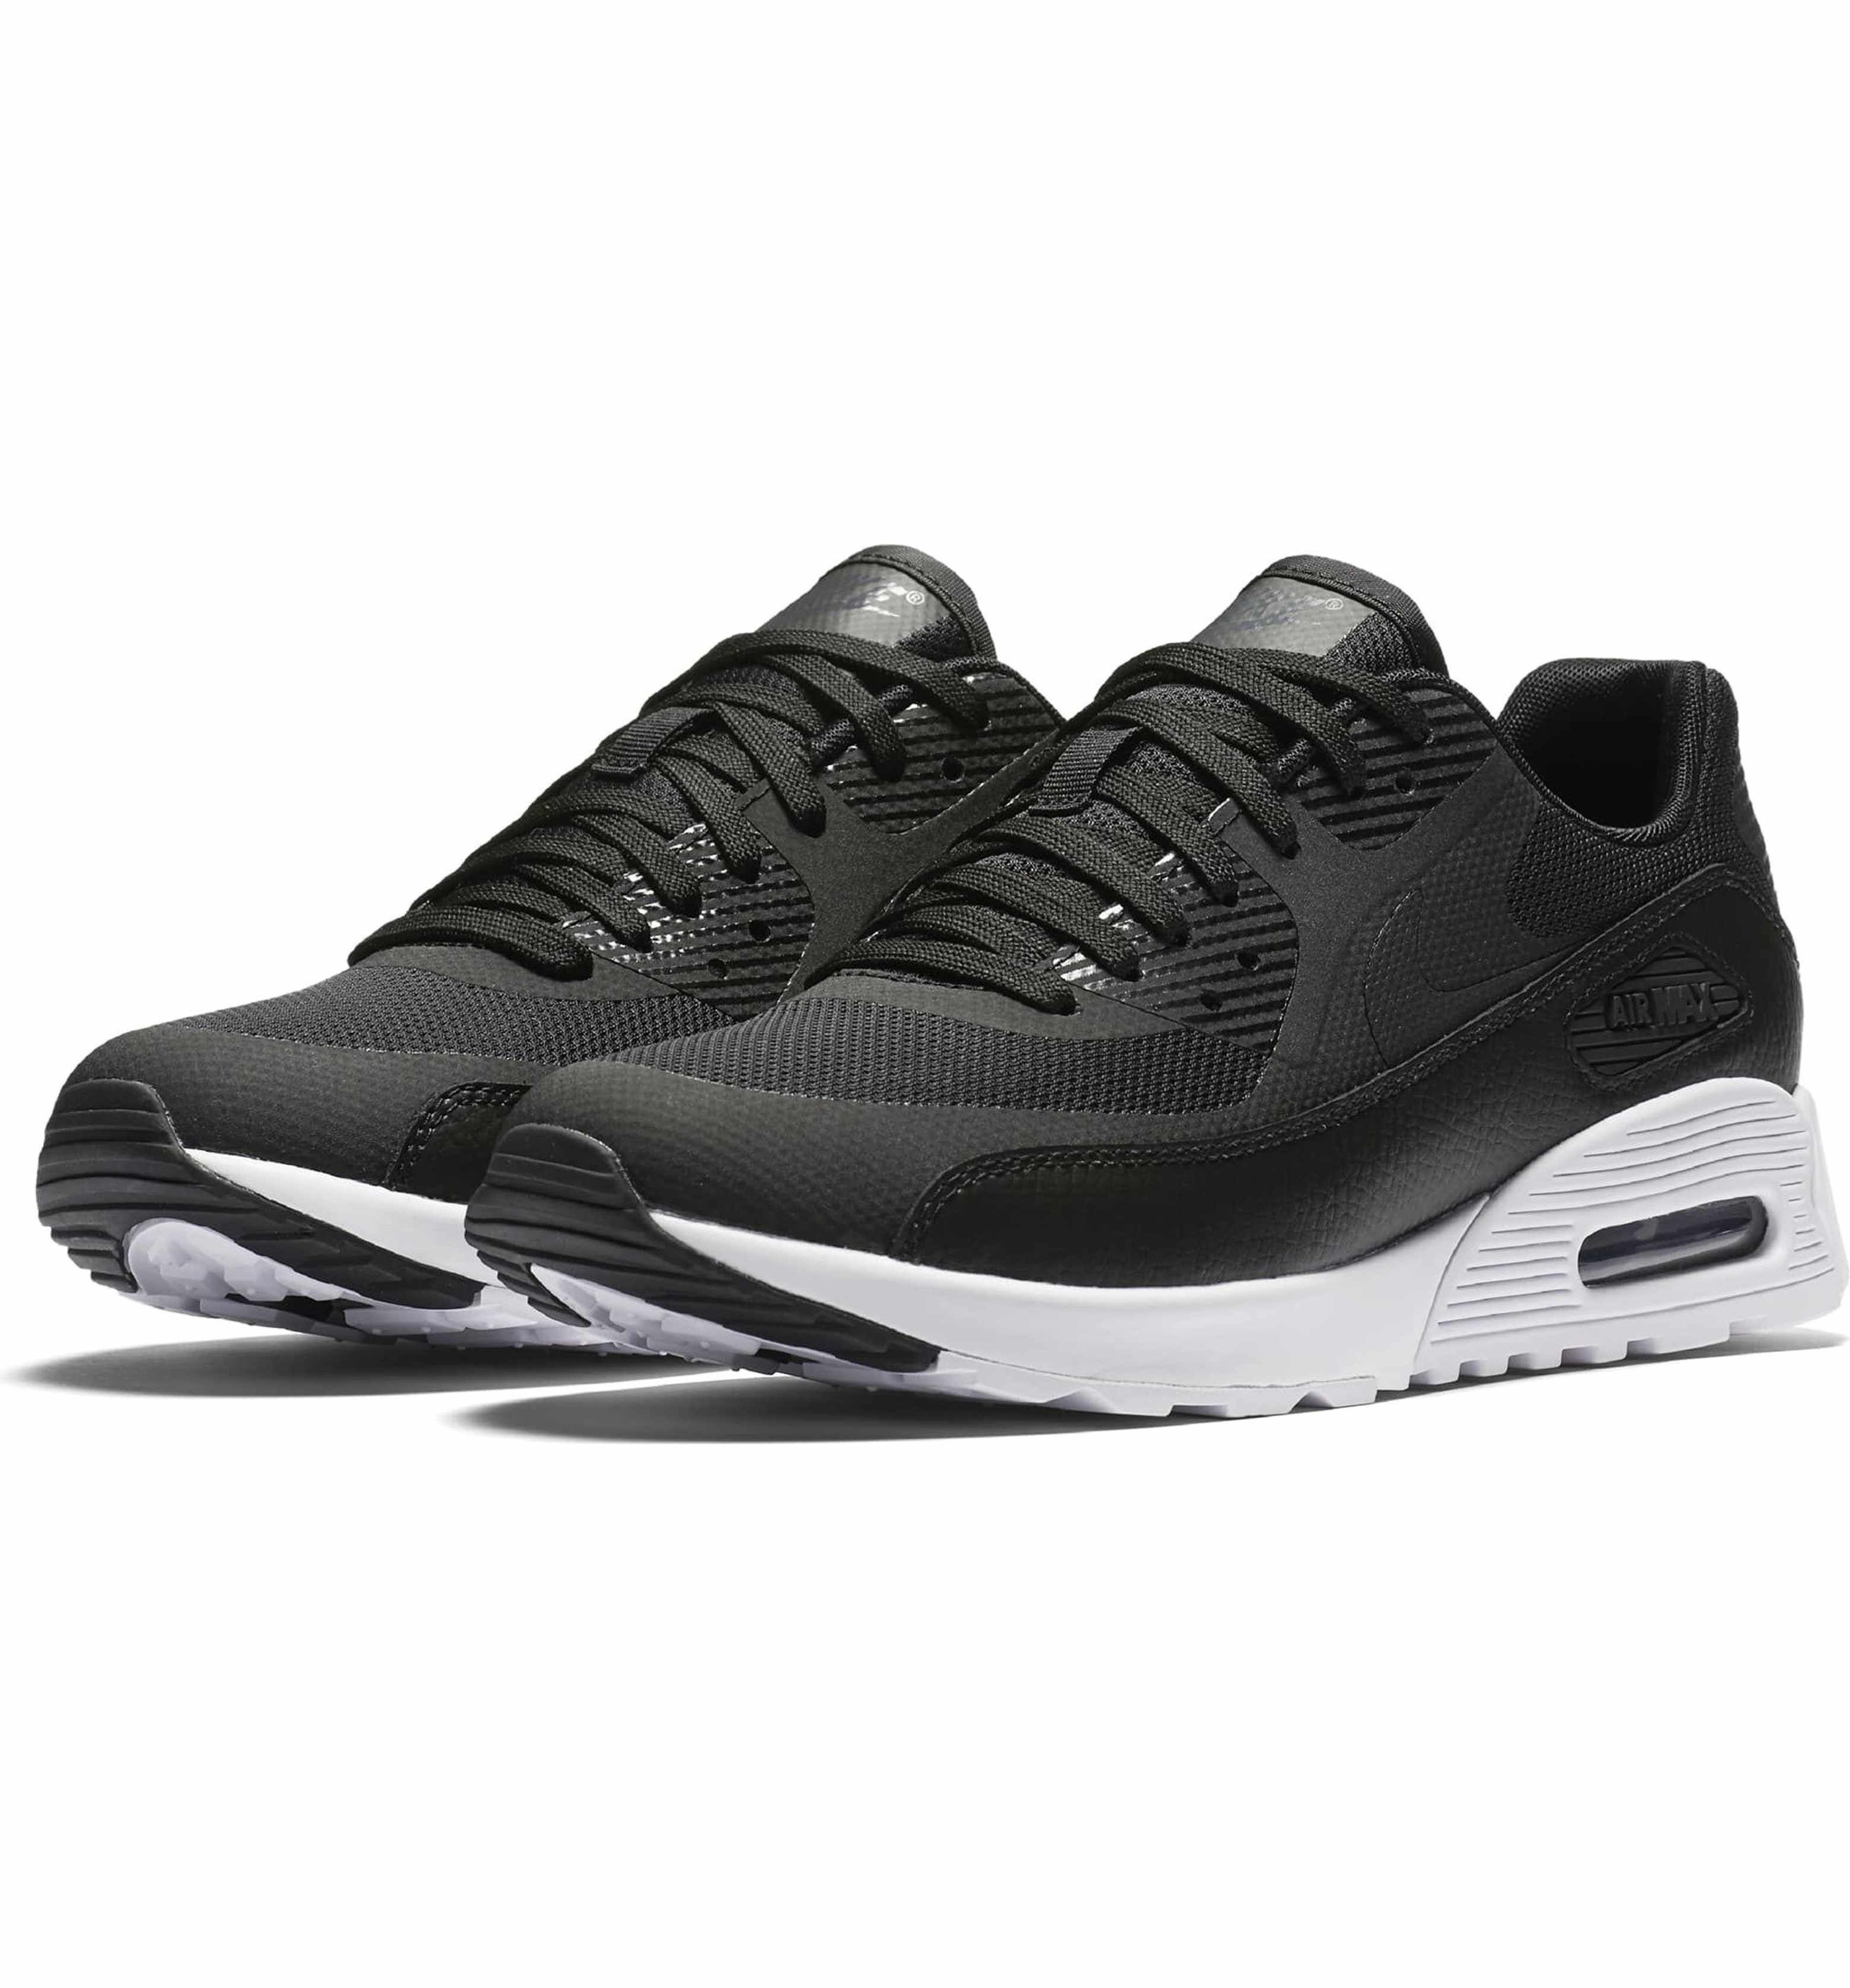 Main Image - Nike Air Max 90 Ultra 2.0 Sneaker (Women)  b4817935fb